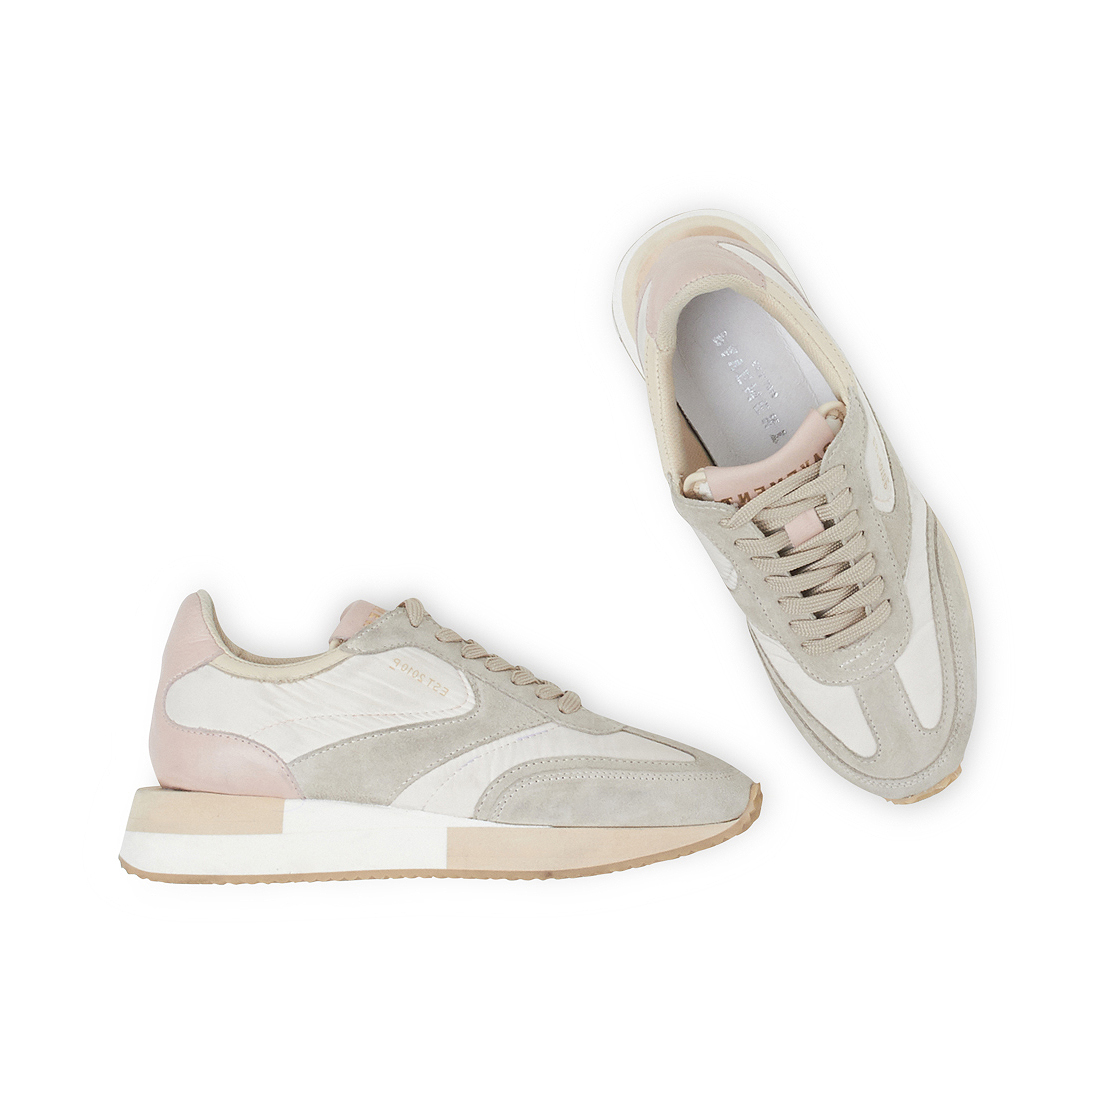 Pavement Ellie sneakers, vanilla, 41